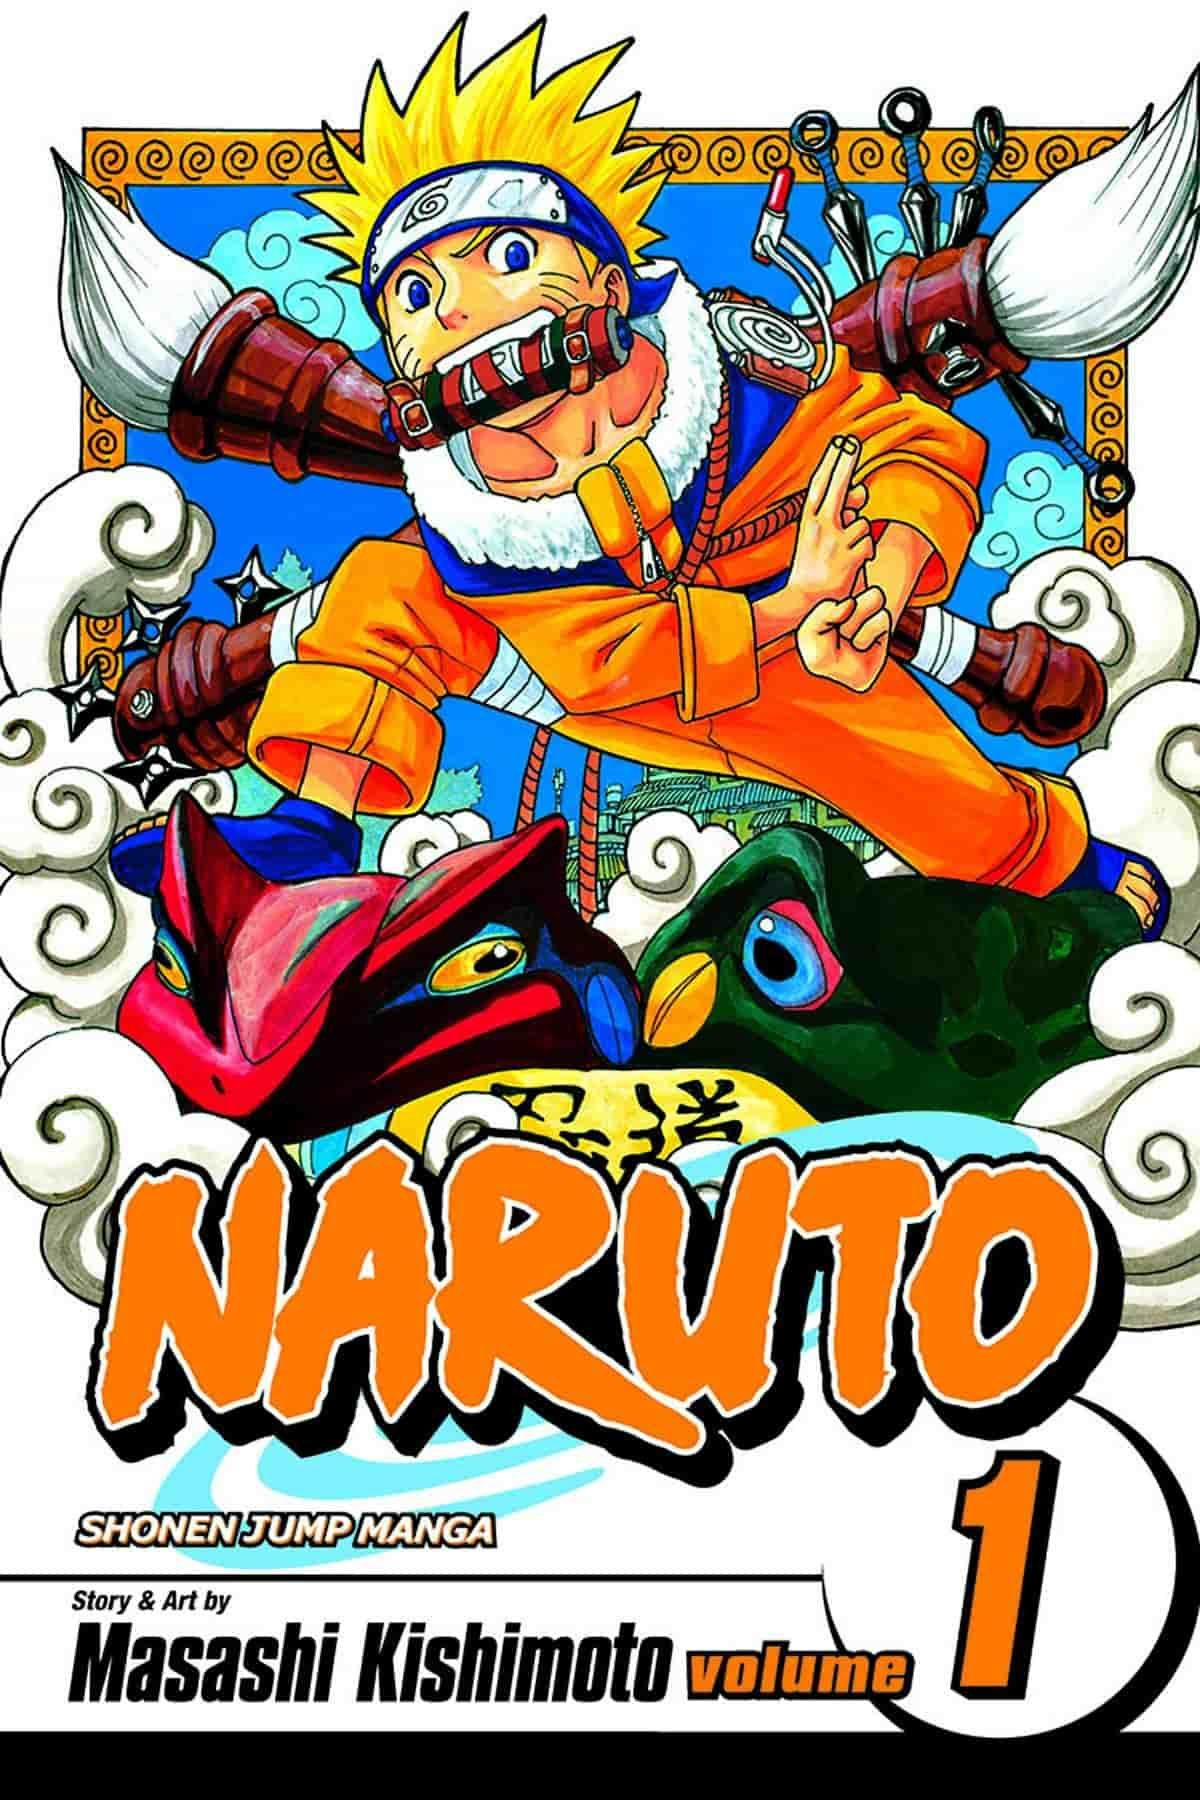 Naruto Shippuden Manga Online in 2020 Naruto 1, Graphic